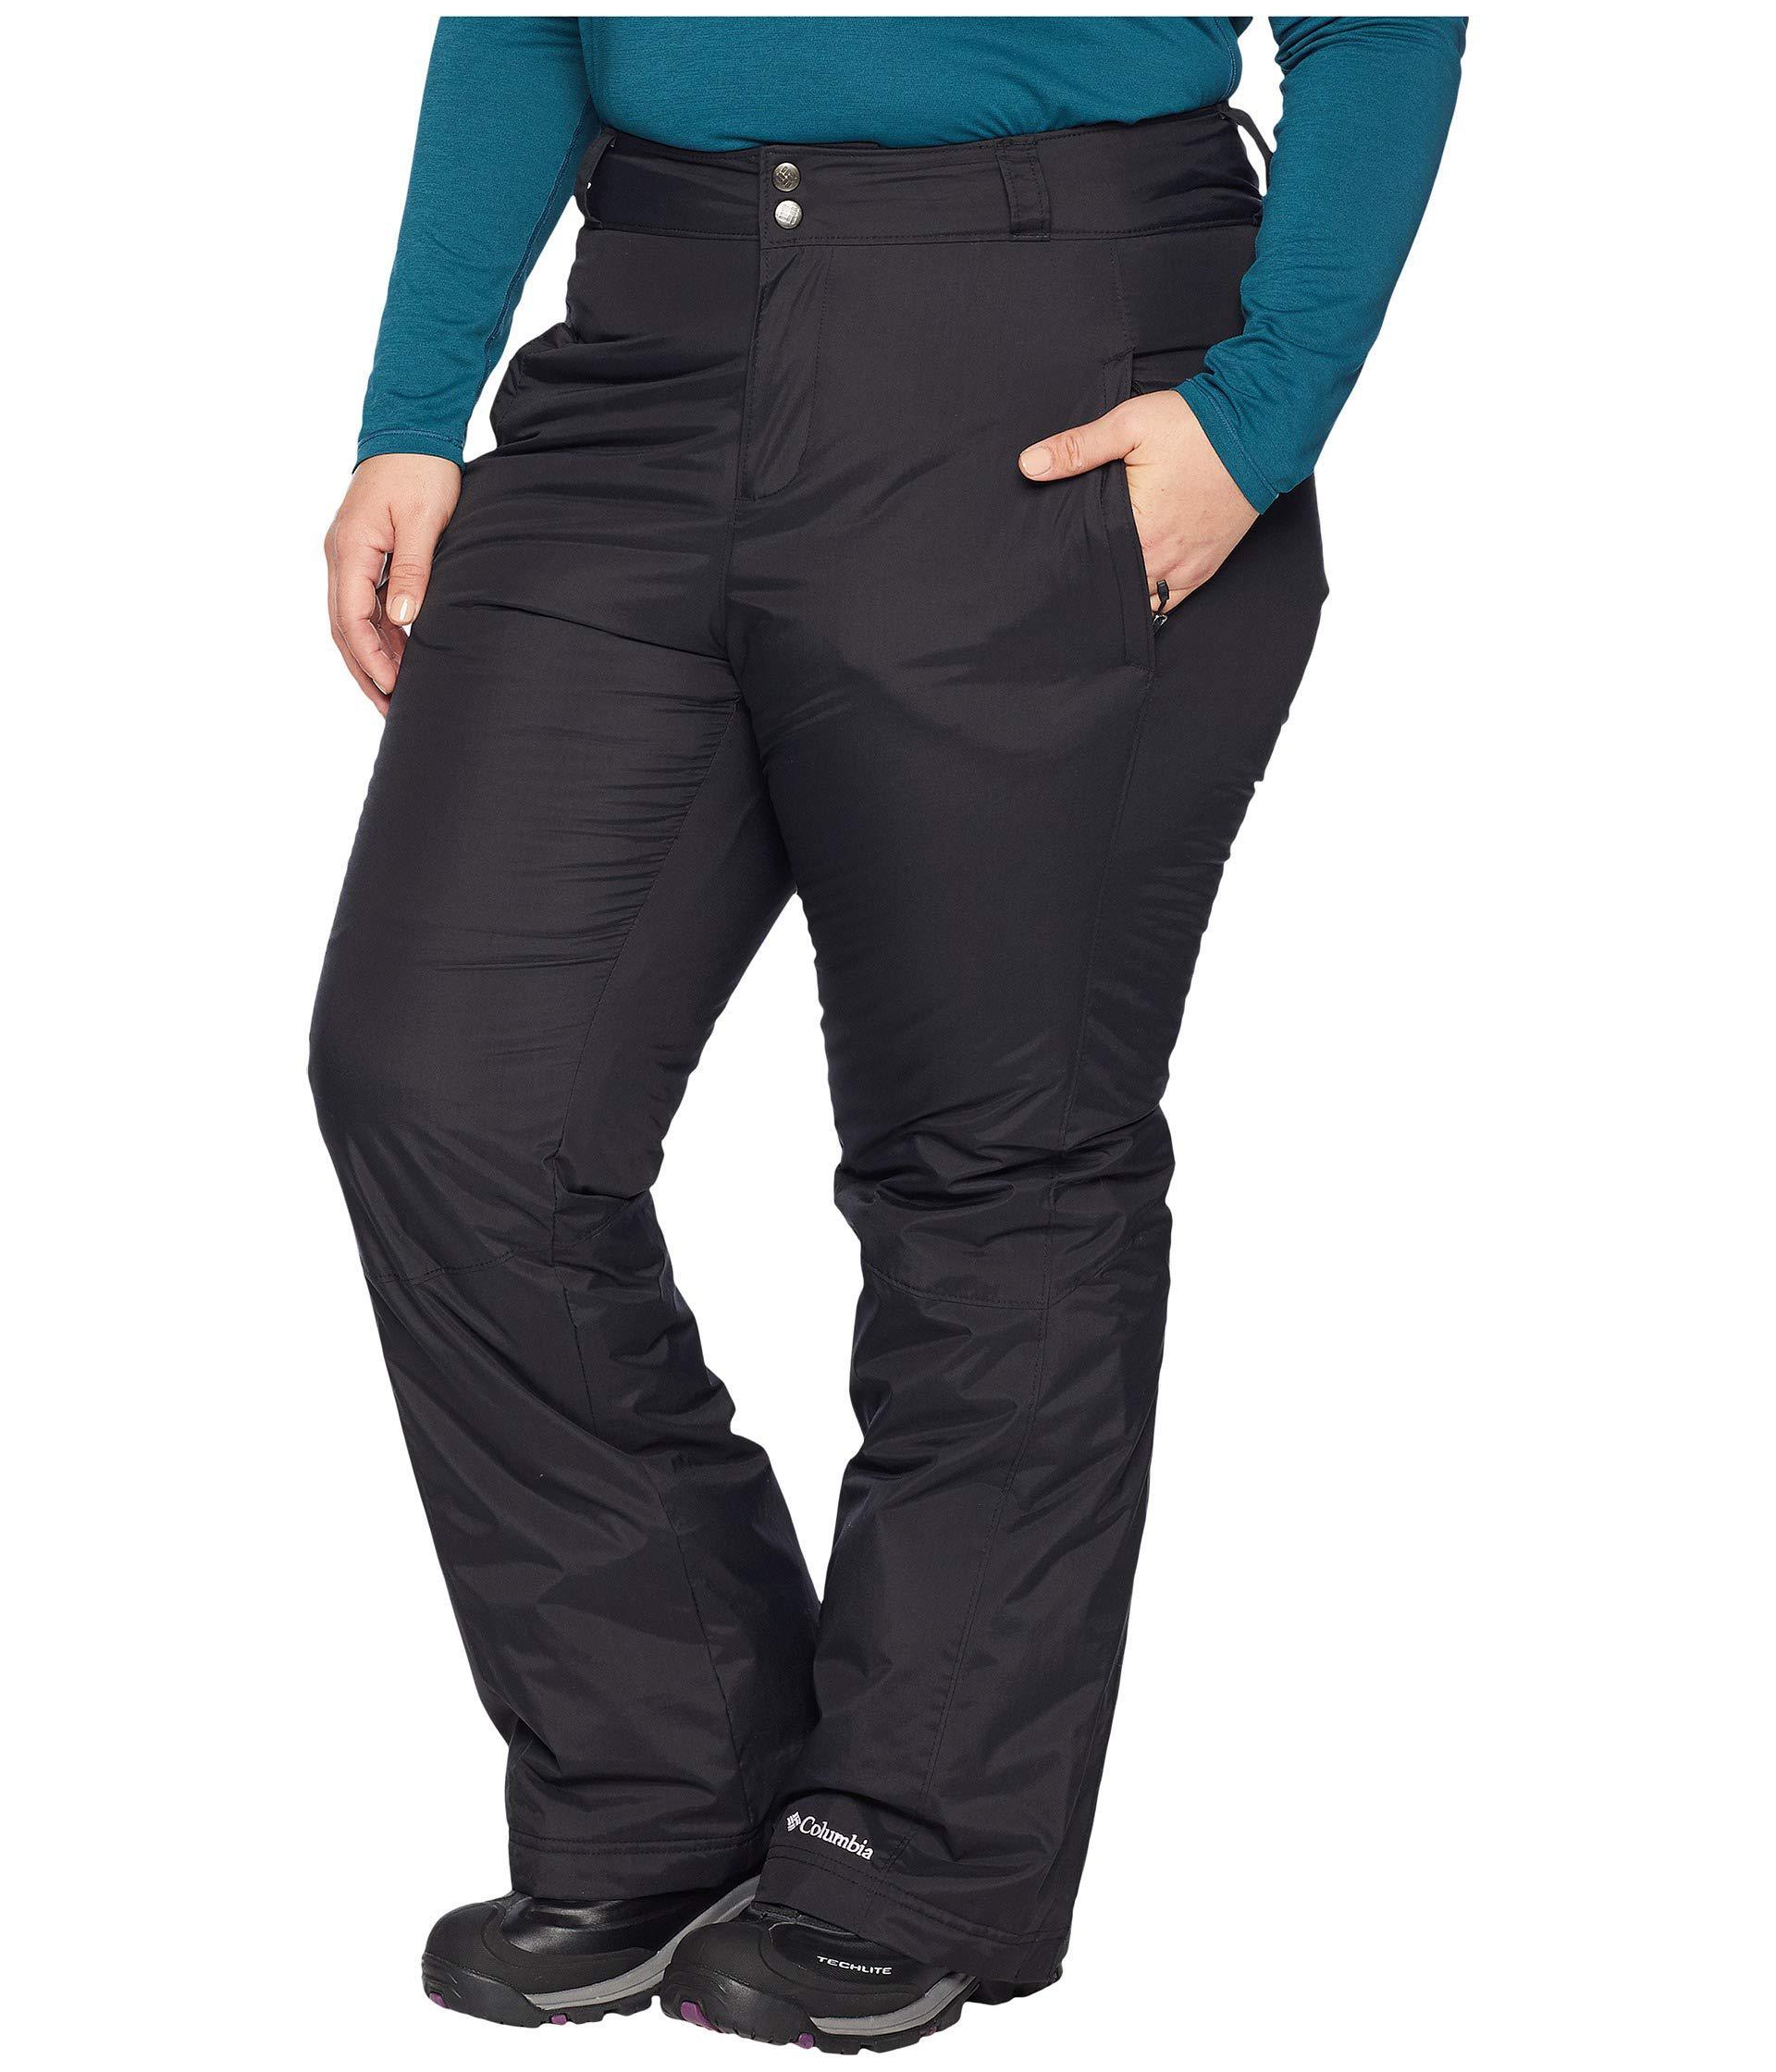 COLUMBIA MODERN MOUNTAIN 2.0 Ski Pants  Women/'s 1X  New  $125